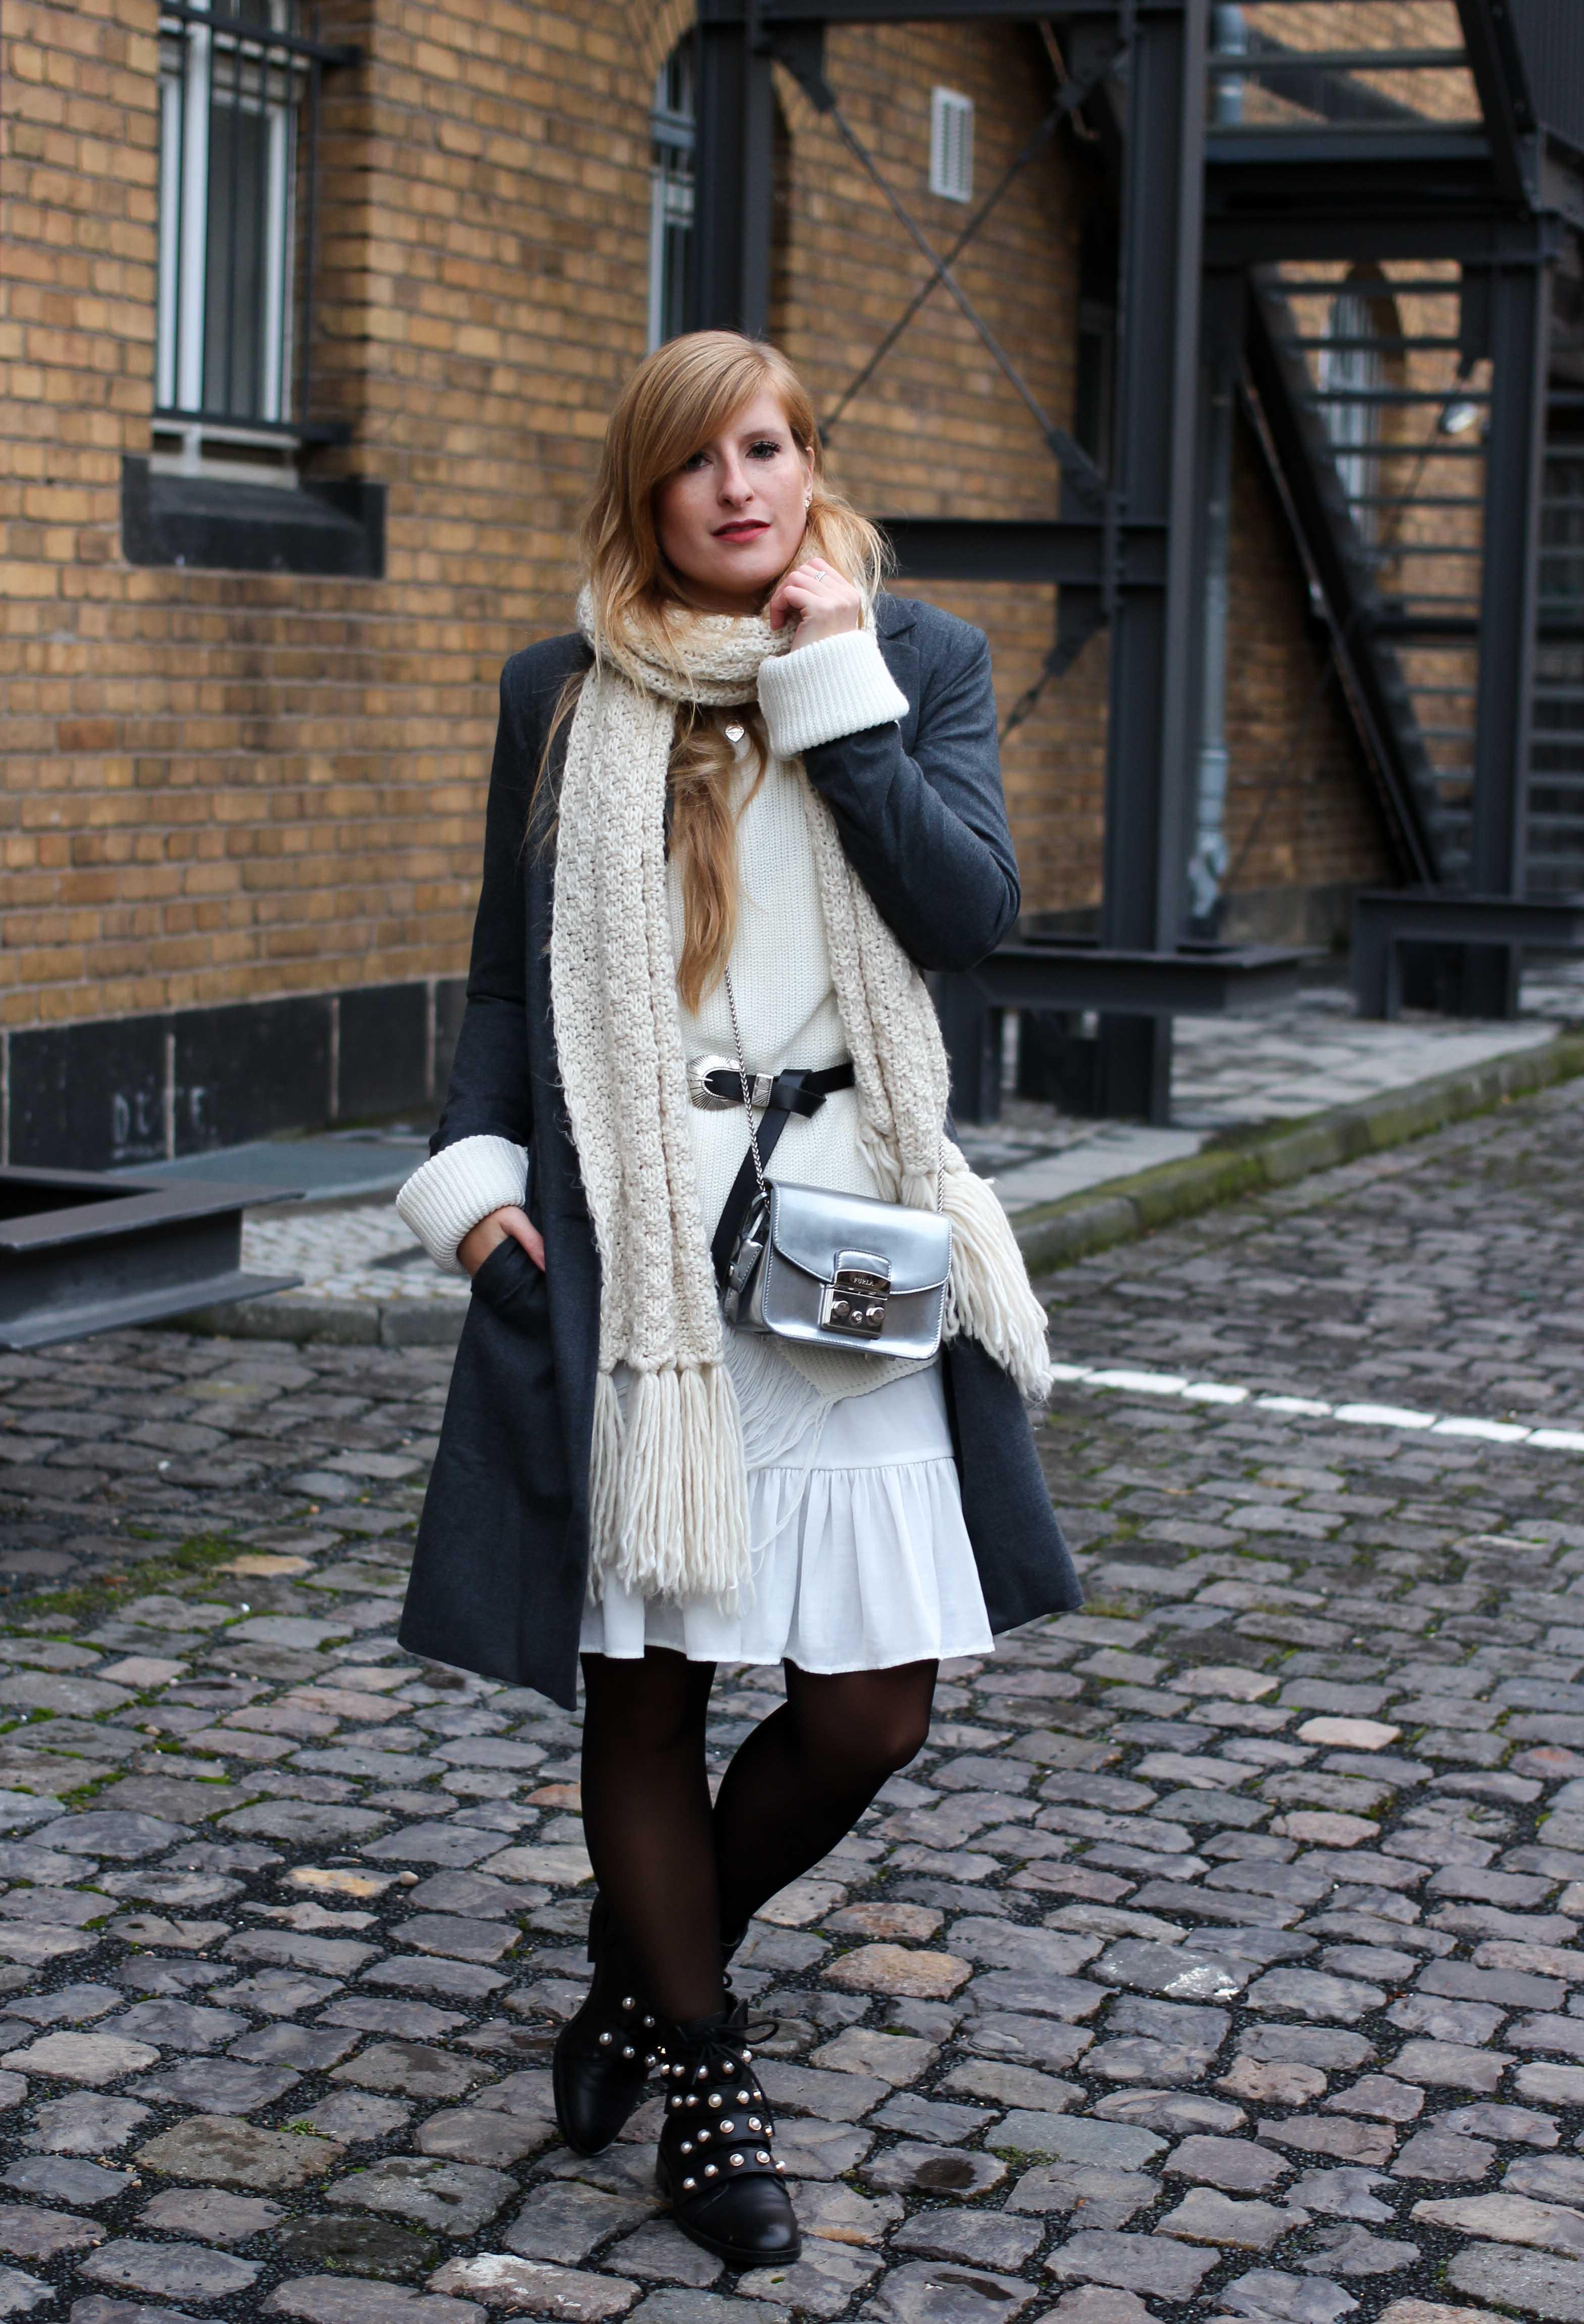 Winter-Layering weißes Kleid, Ripped Pullover Asos schwarze Strumpfhose Hunkemöller kombinieren Outfit Modeblog bonn 1